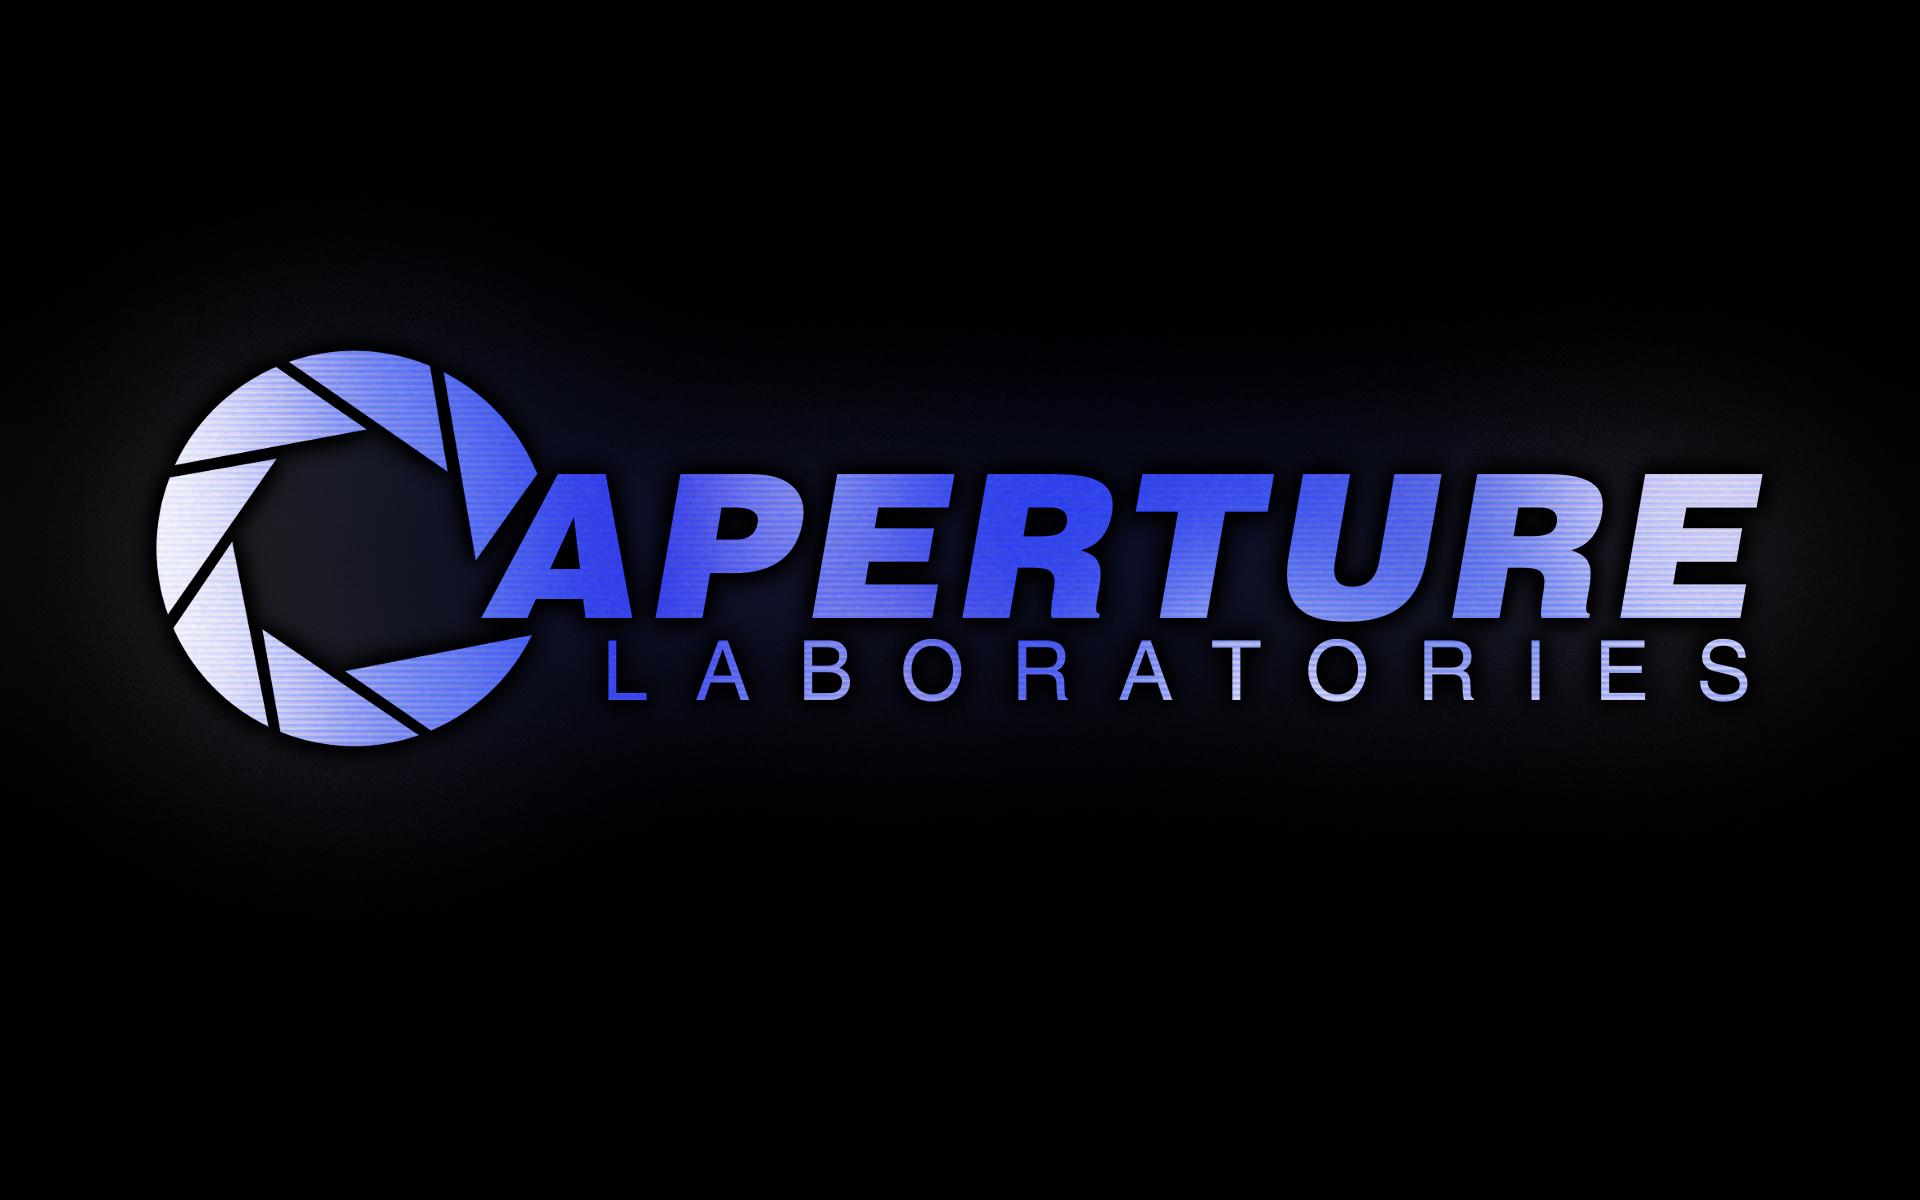 science portal aperture laboratories HD Wallpaper   Games 351818 1920x1200